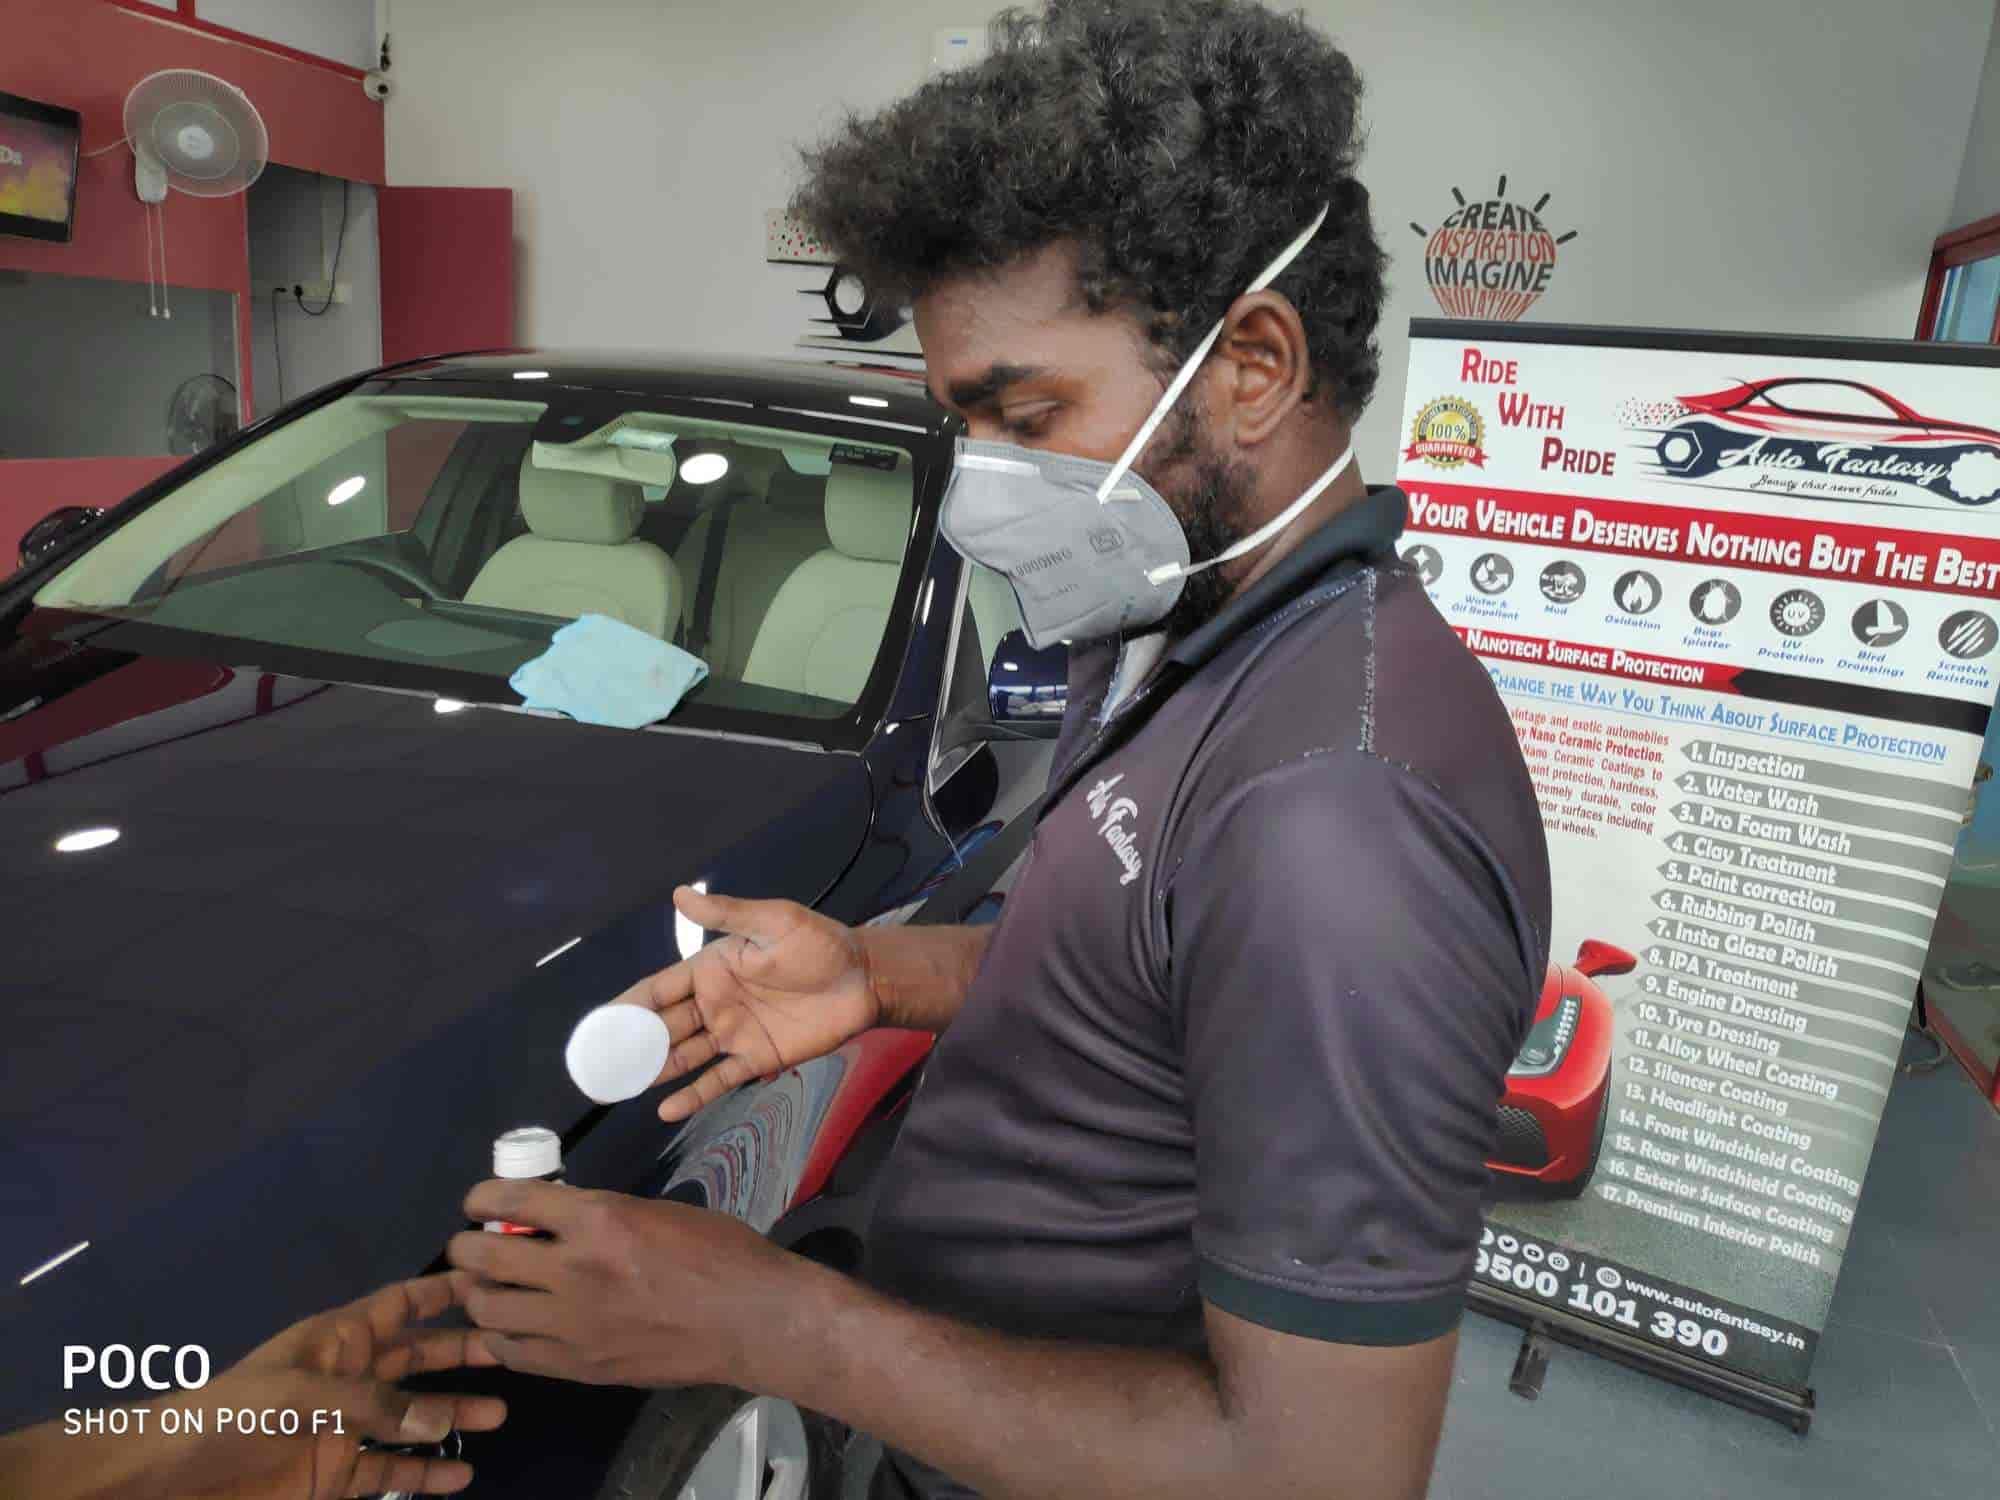 Auto Fantasy, Poonamallee - Car Repair & Services in Chennai